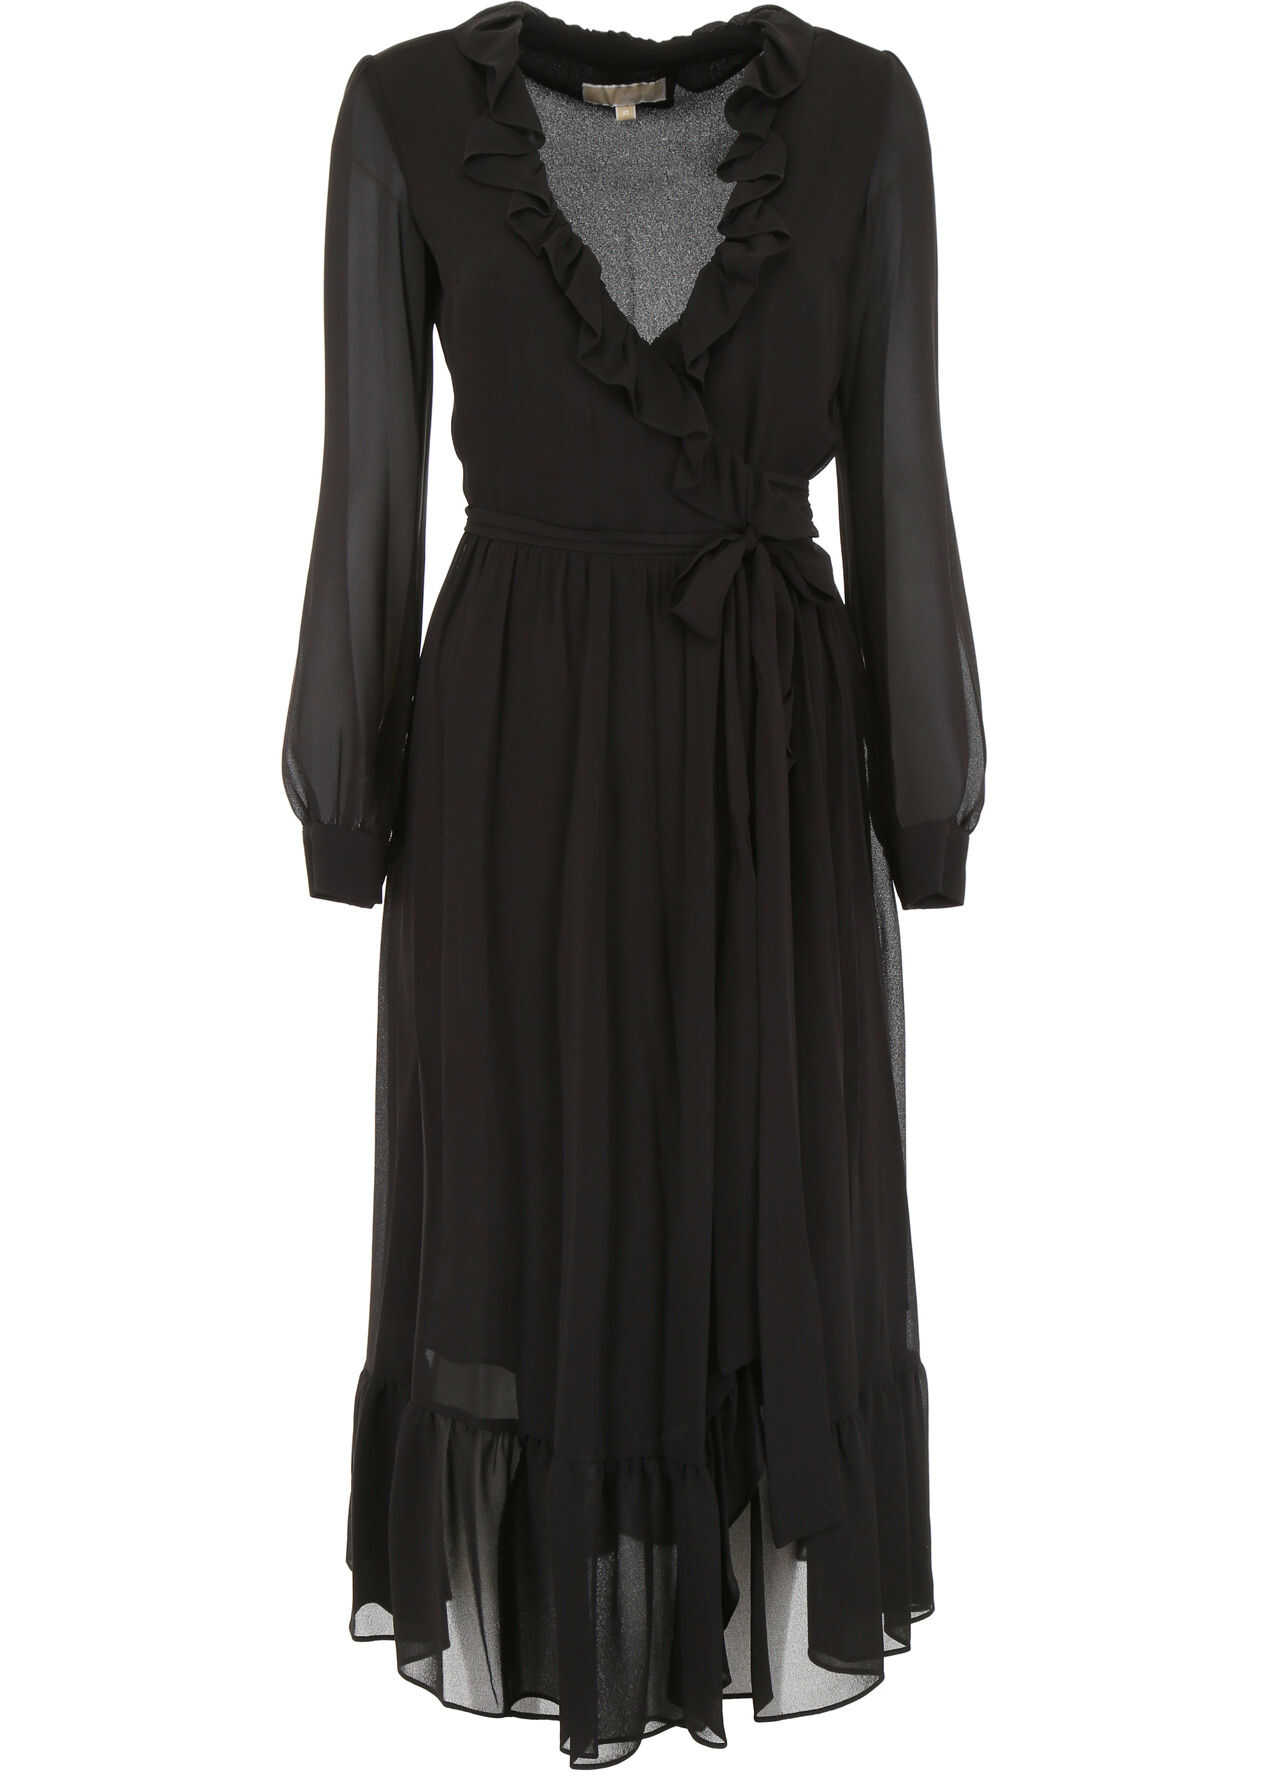 Michael Kors Wrap Dress BLACK